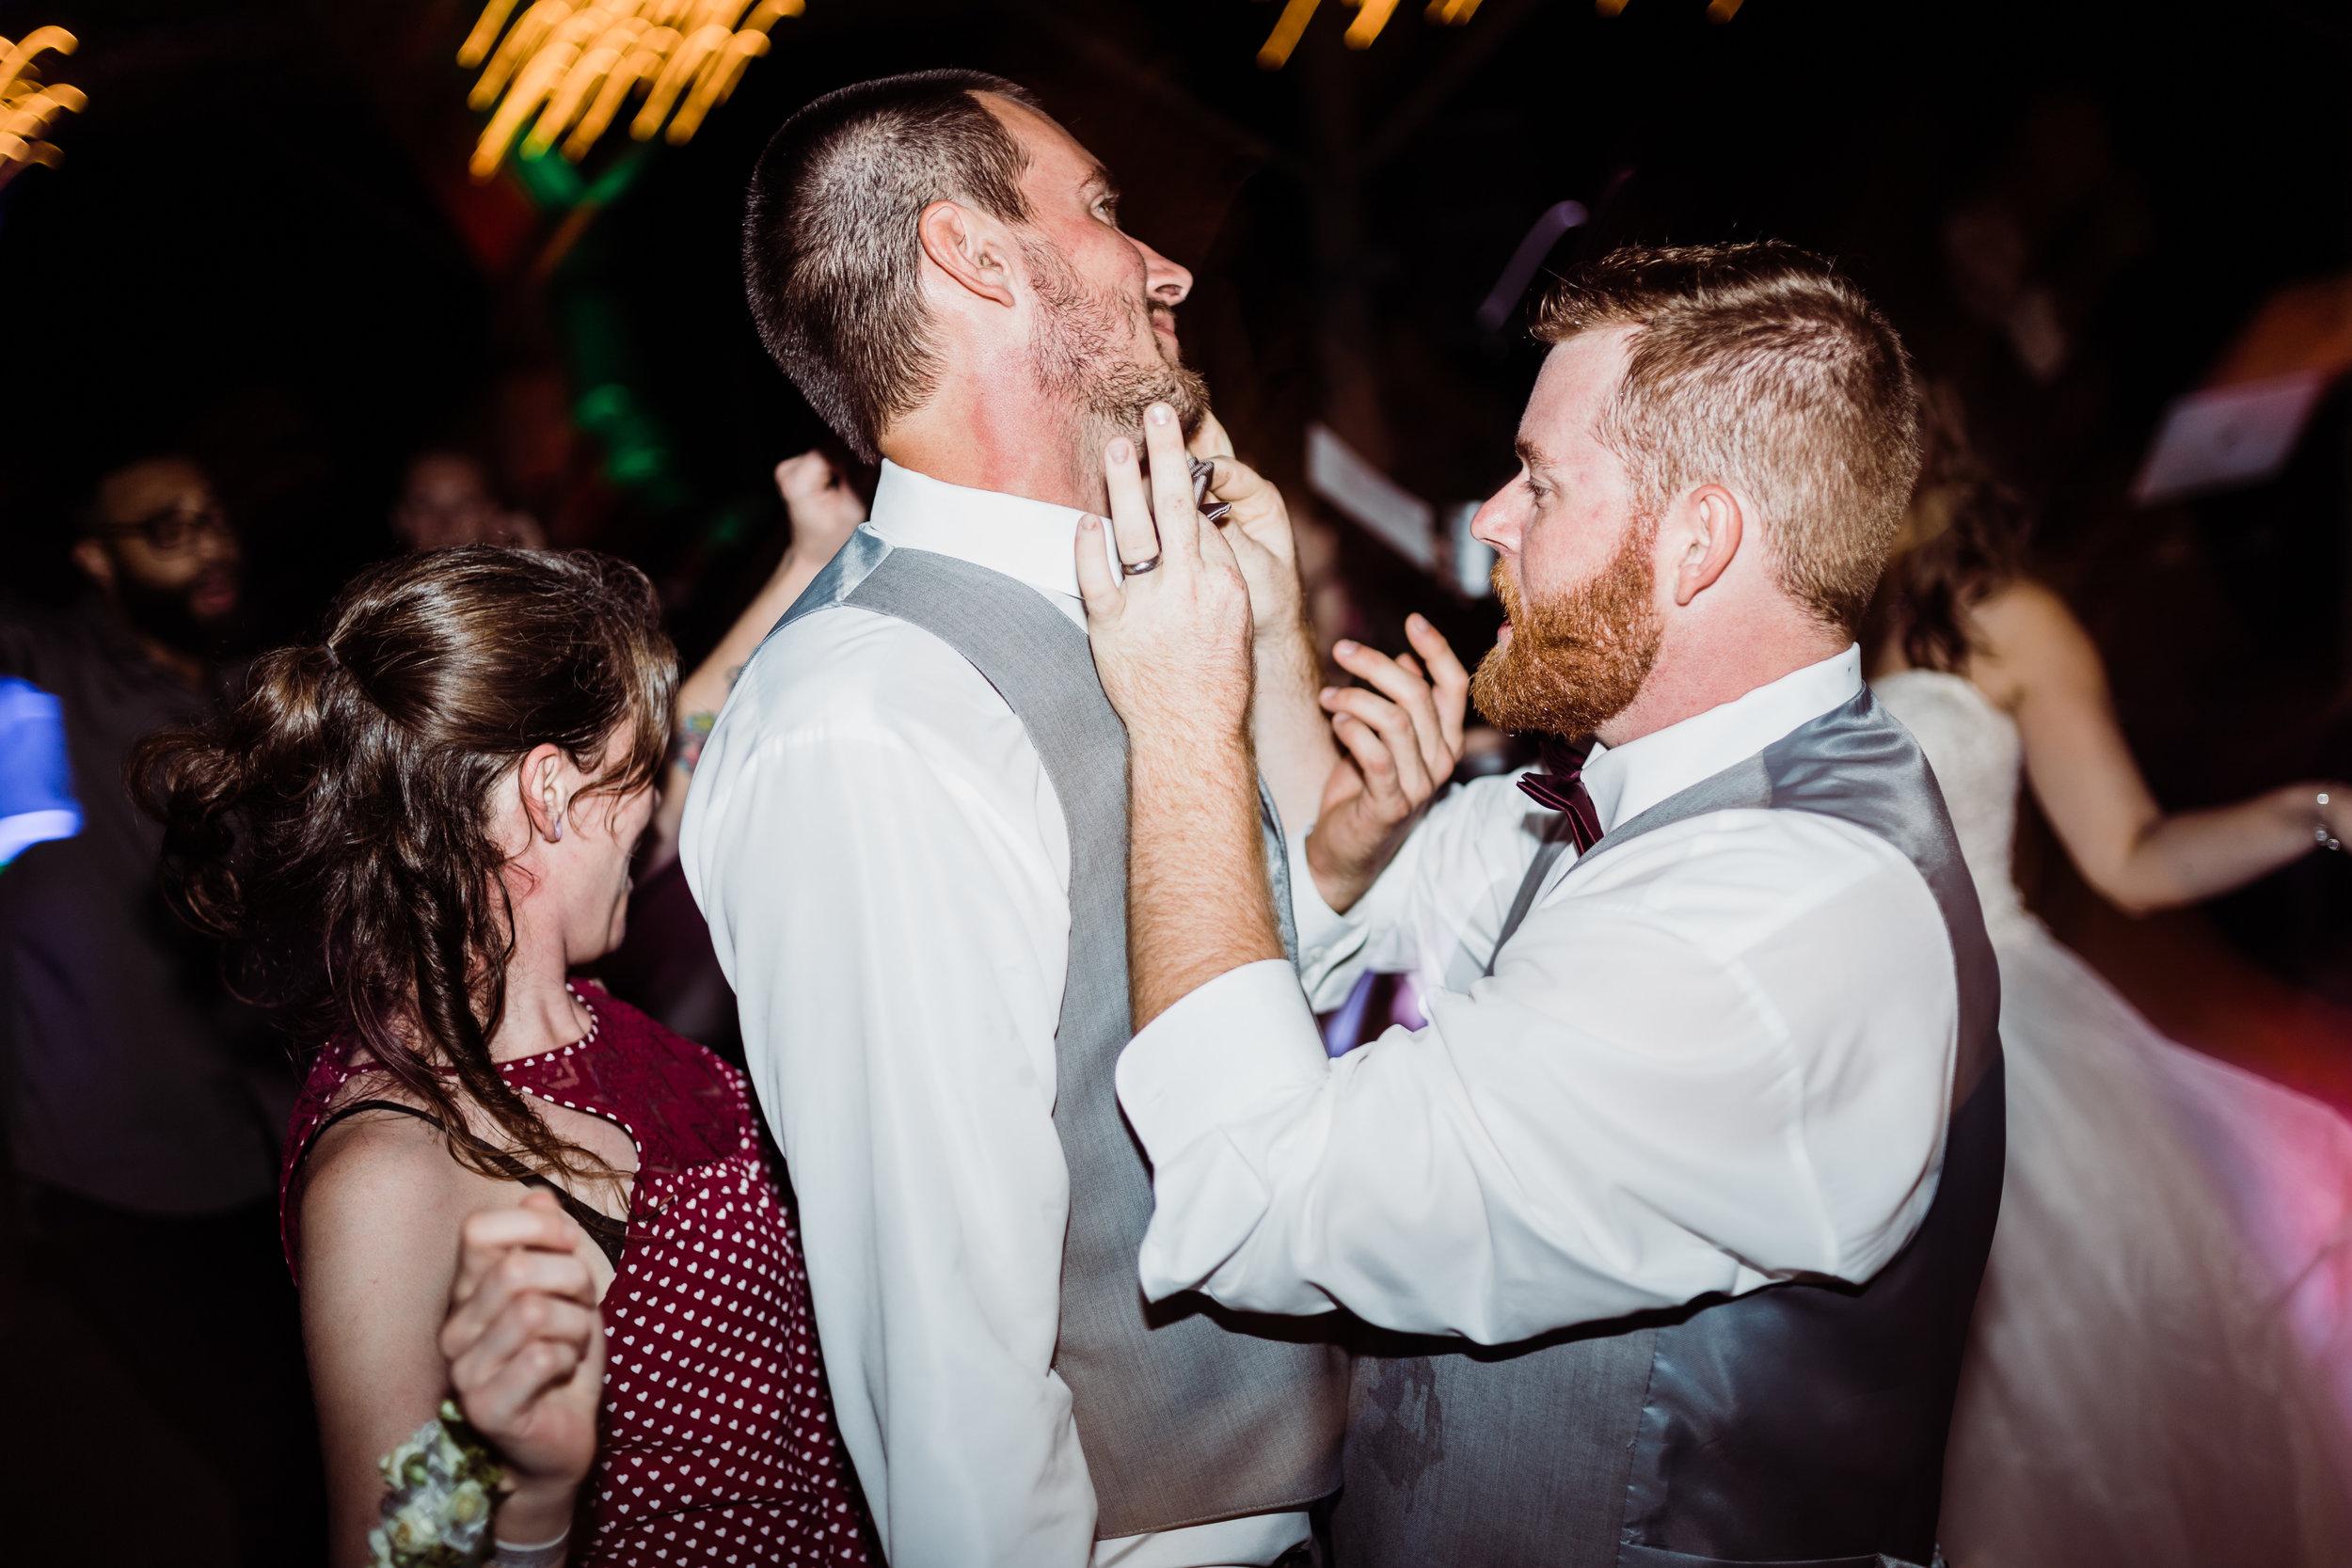 2017.10.14 Samantha and Matthew Crabtree Sarasota Wedding (627 of 708).jpg